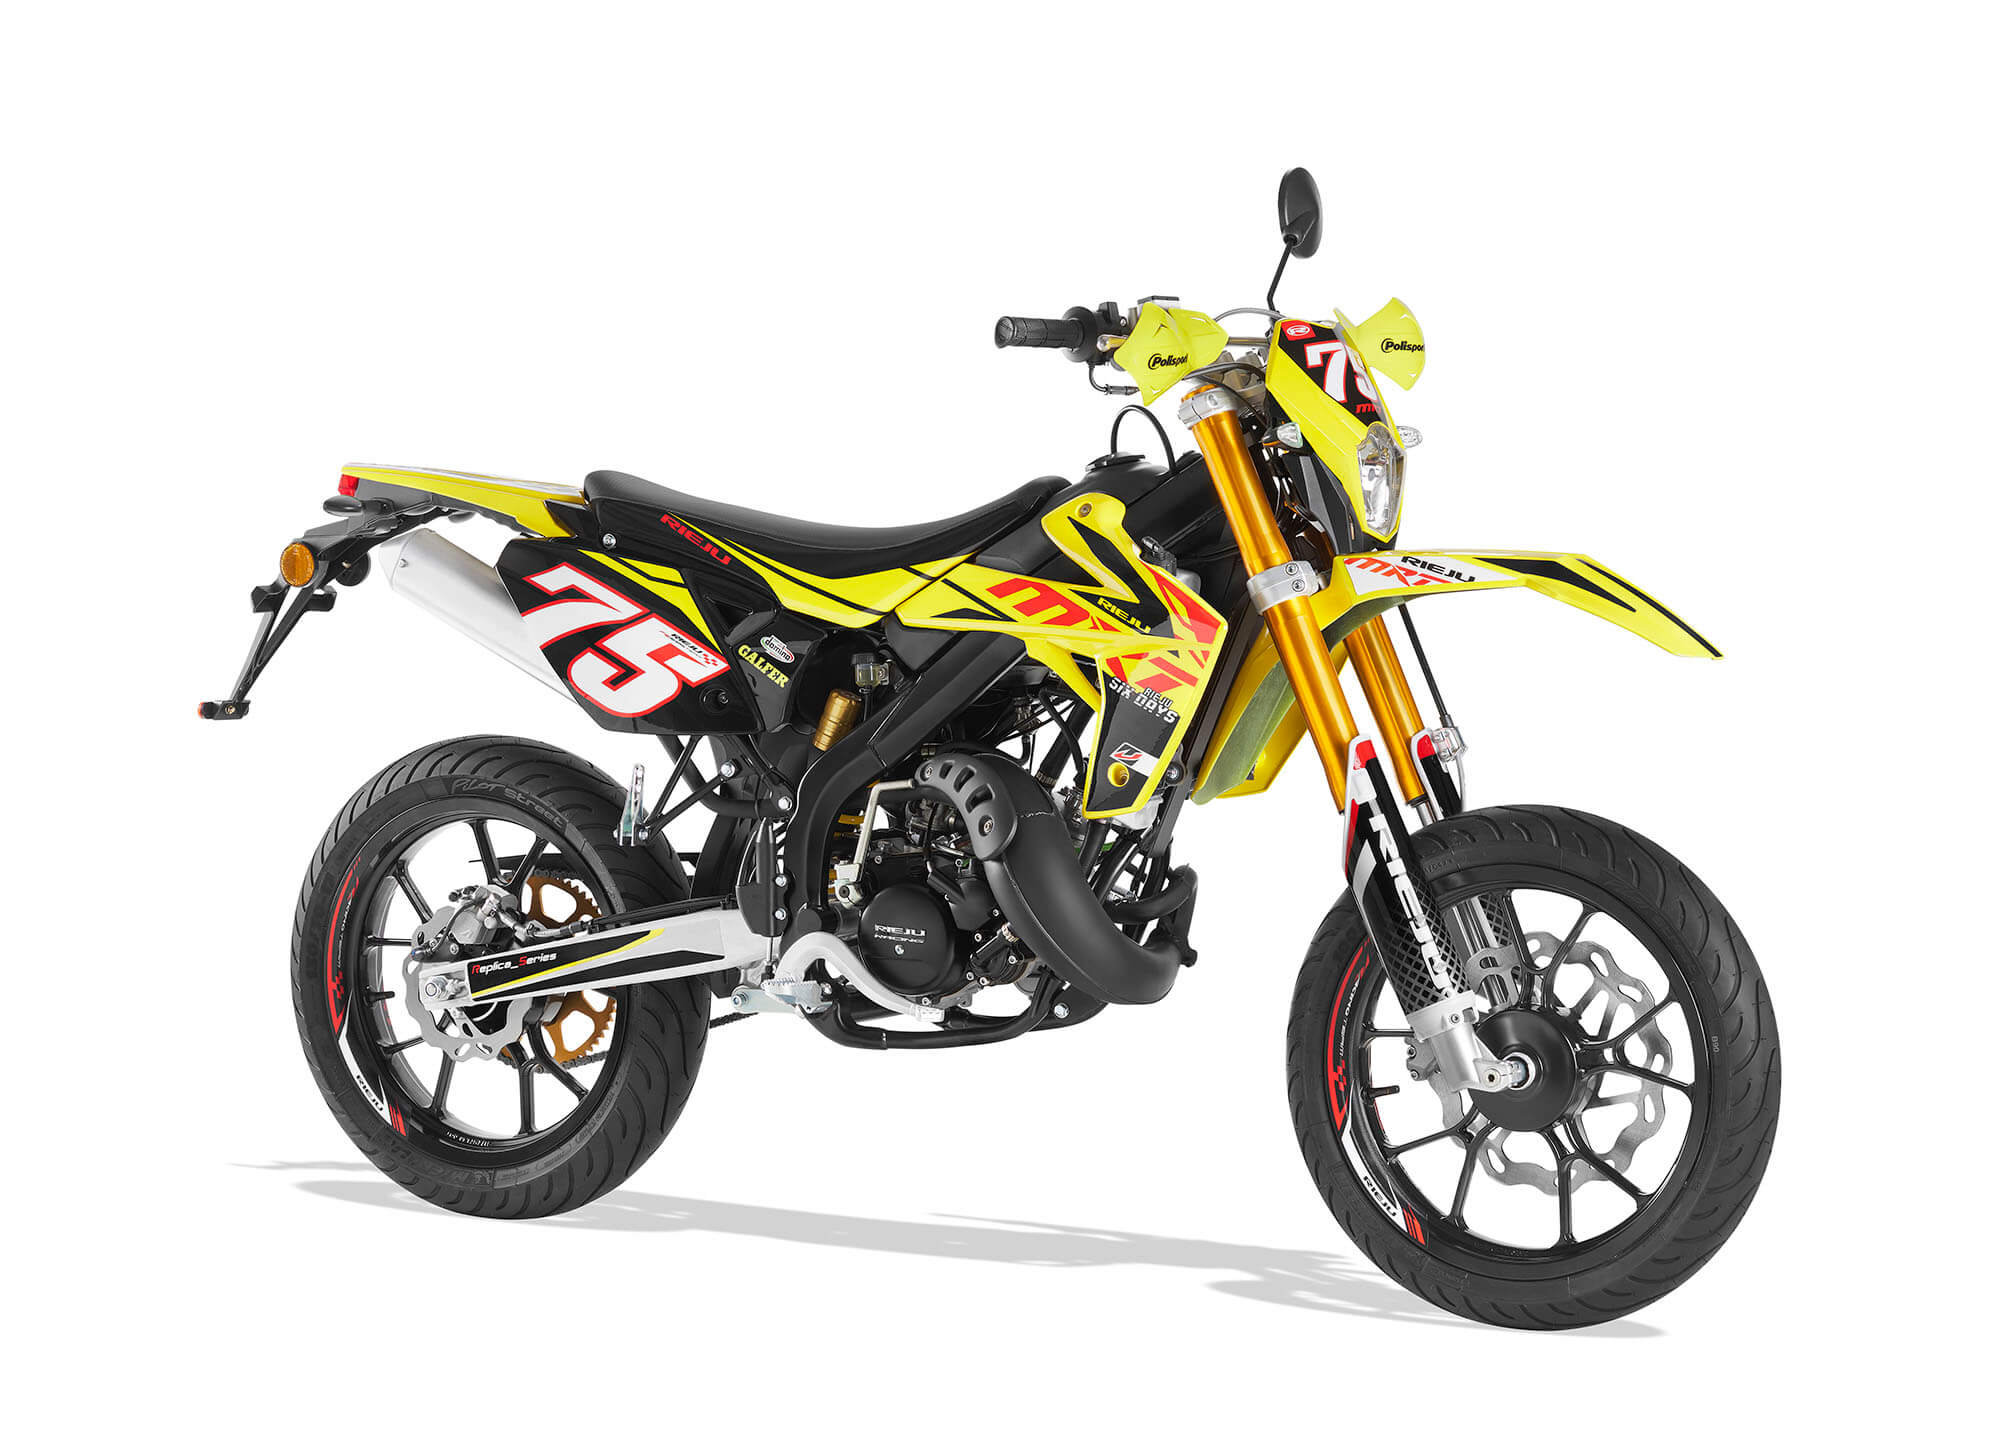 comprar-motos-rieju-mrt-pro-replica-sm-50-amarillo-motissimo-barcelona